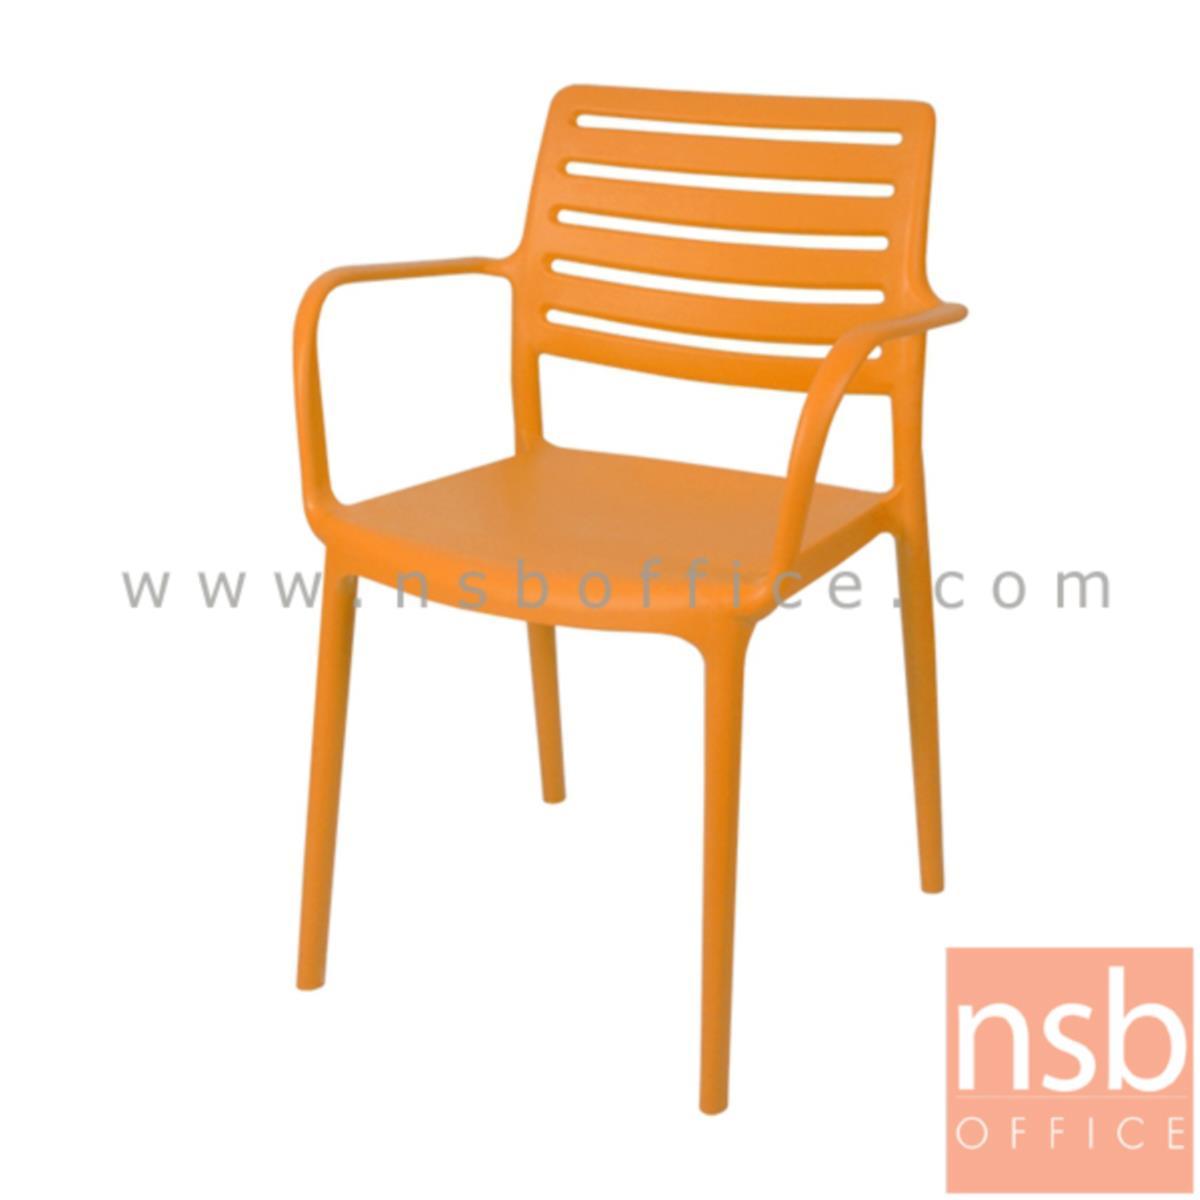 B29A201:เก้าอี้โมเดิร์นพลาสติกล้วน รุ่น POI-PN72  ขนาด 57W cm.